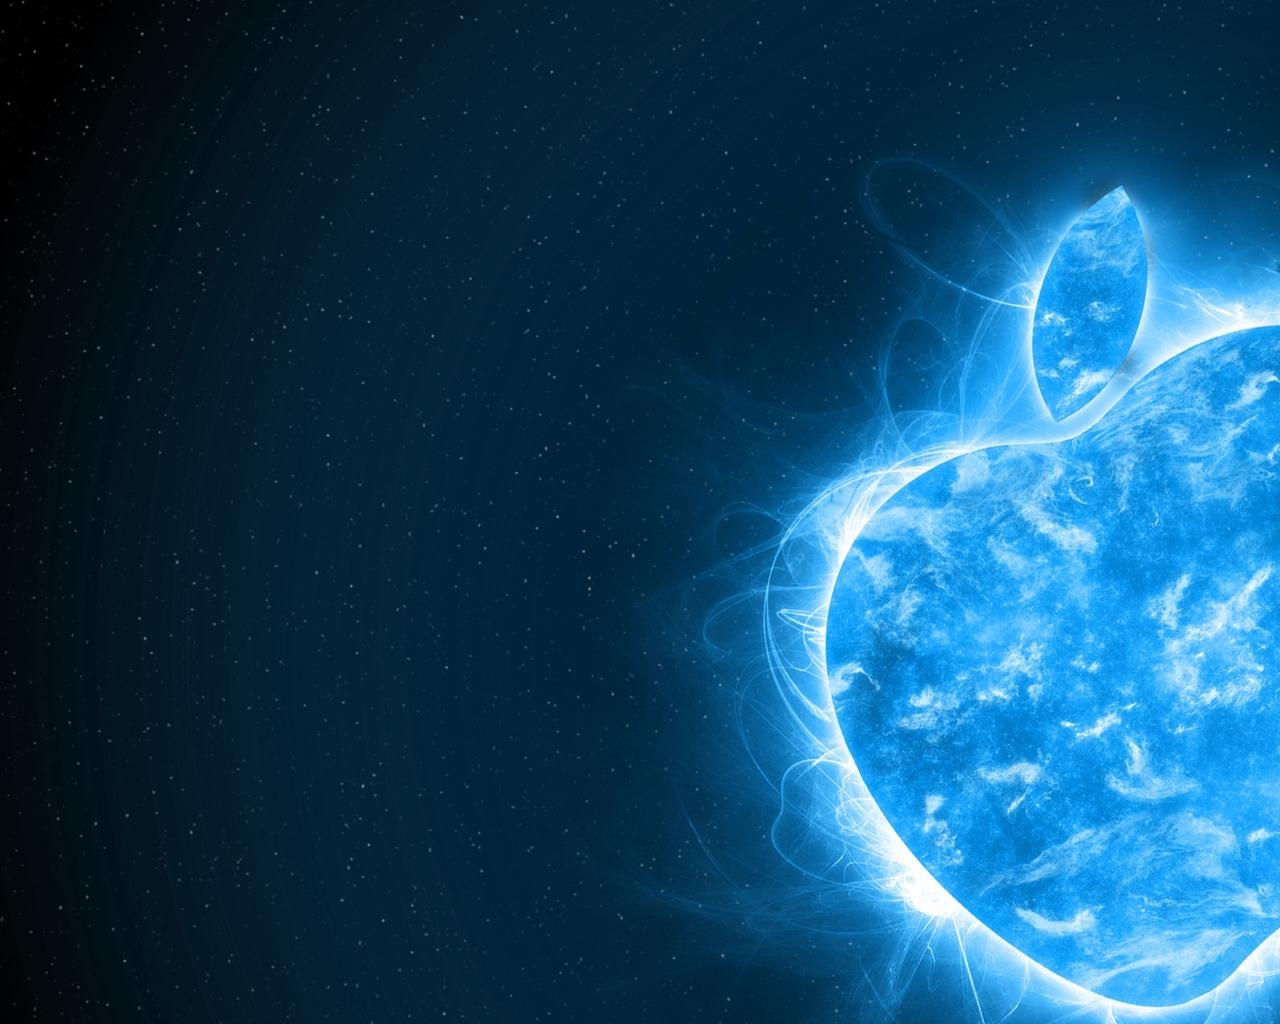 Wallpaper Blue apple allgifgallery 1280x1024